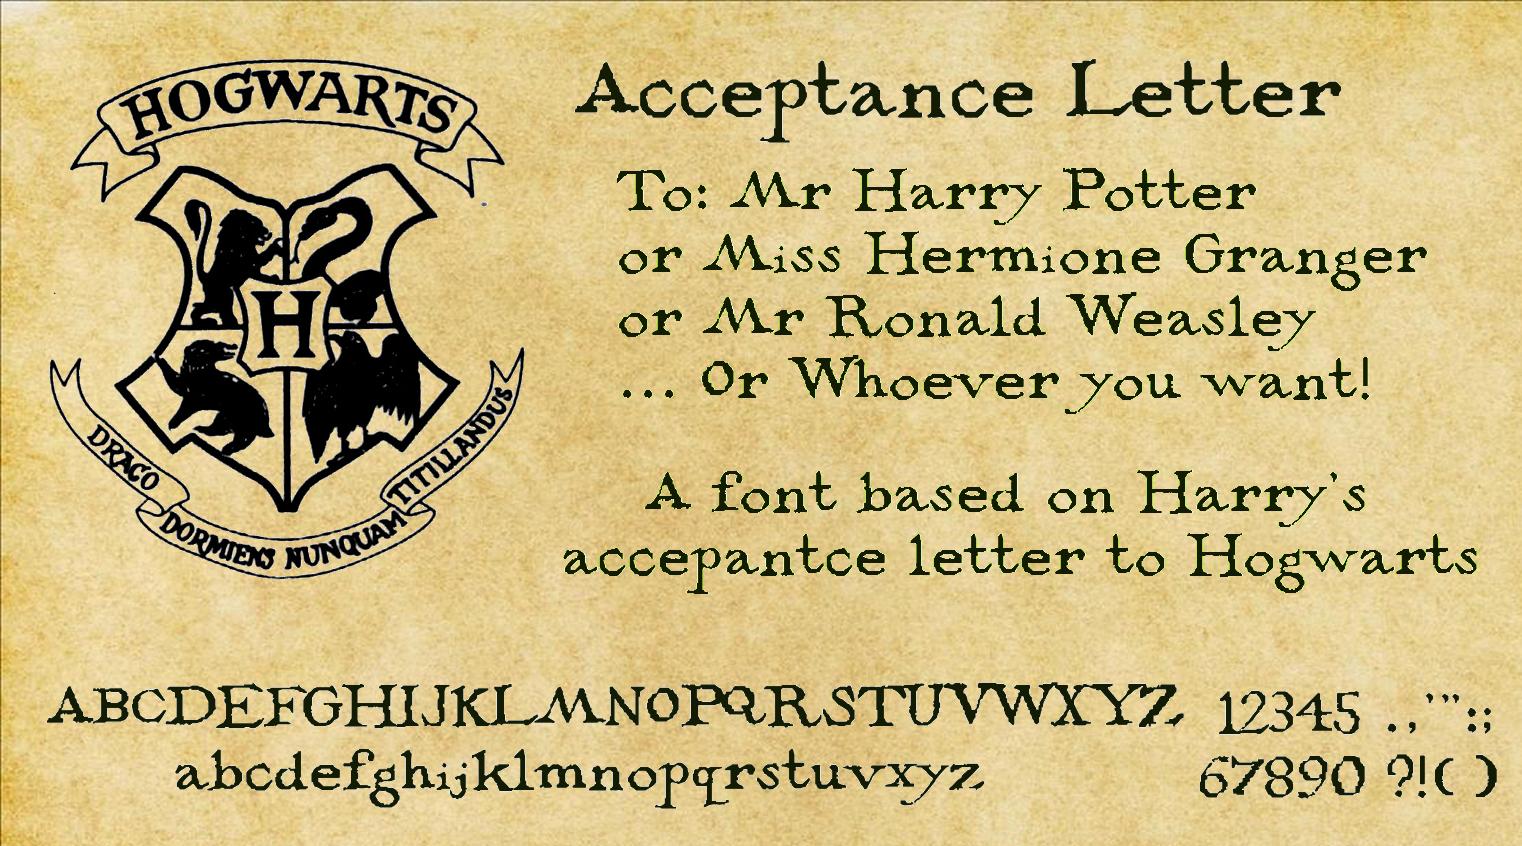 Hogwarts Acceptance Letter  Acceptance Letter By Decat On